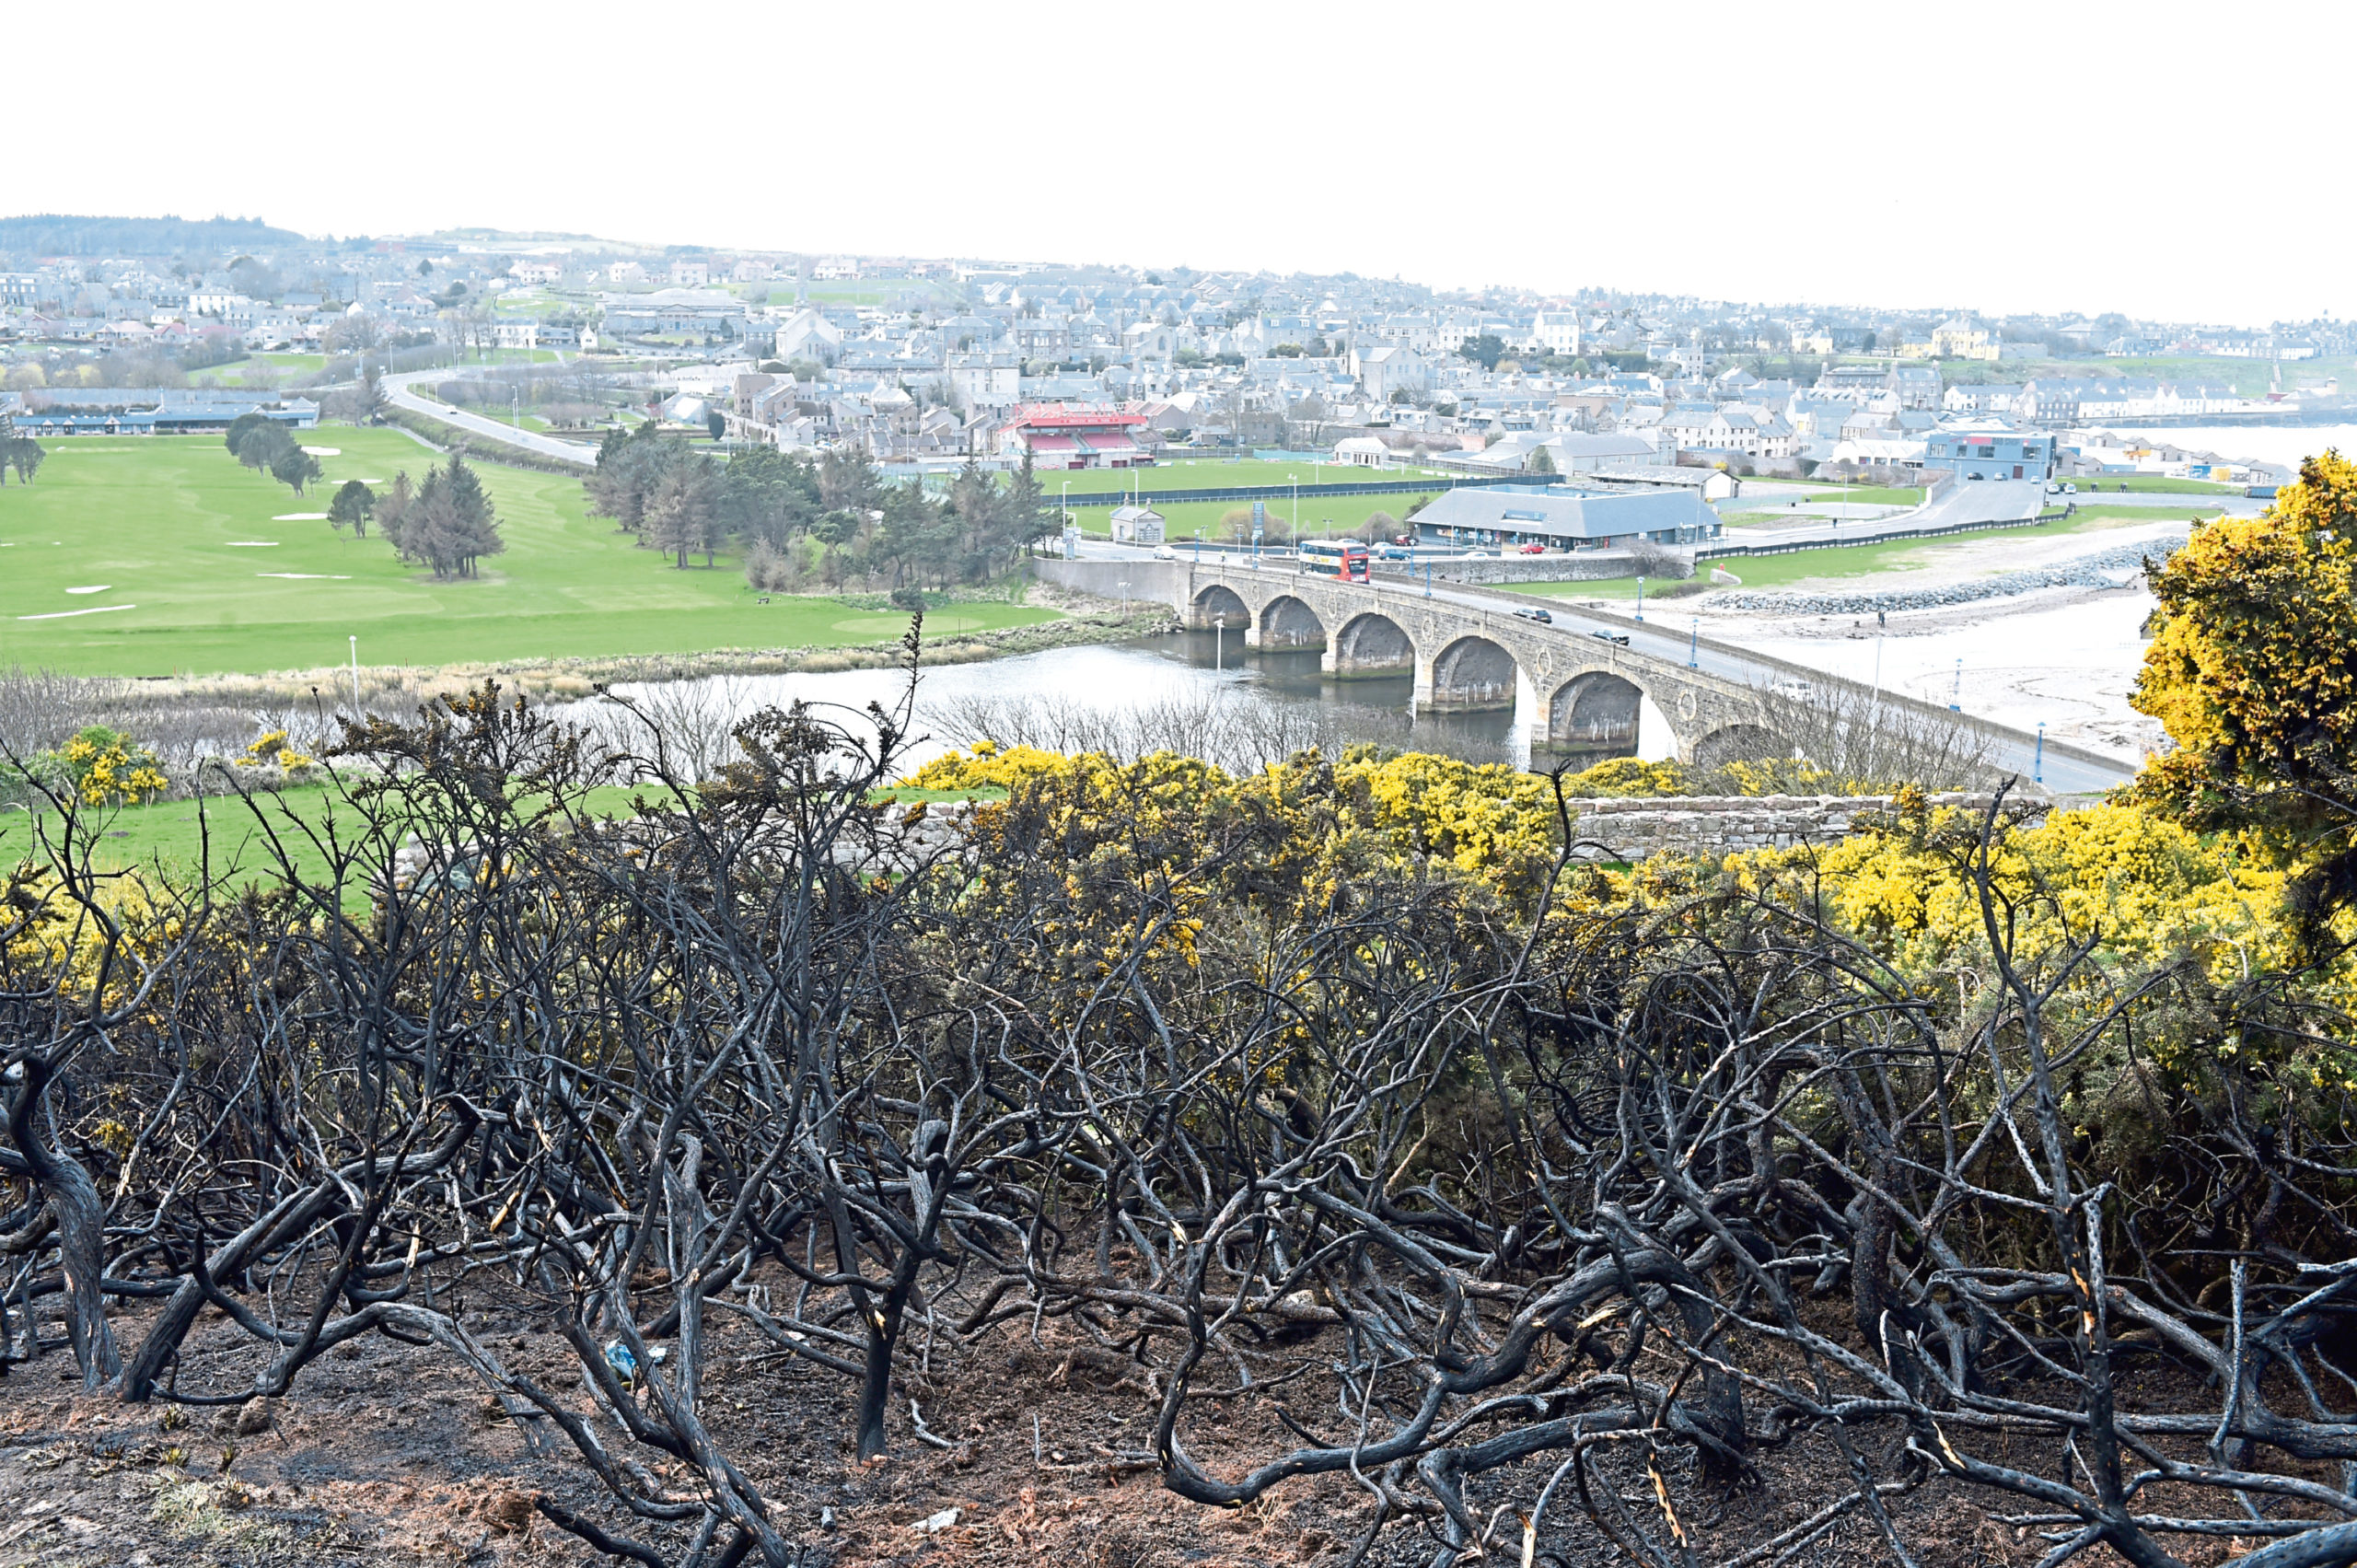 The site of yesterday's gorse fire near Macduff